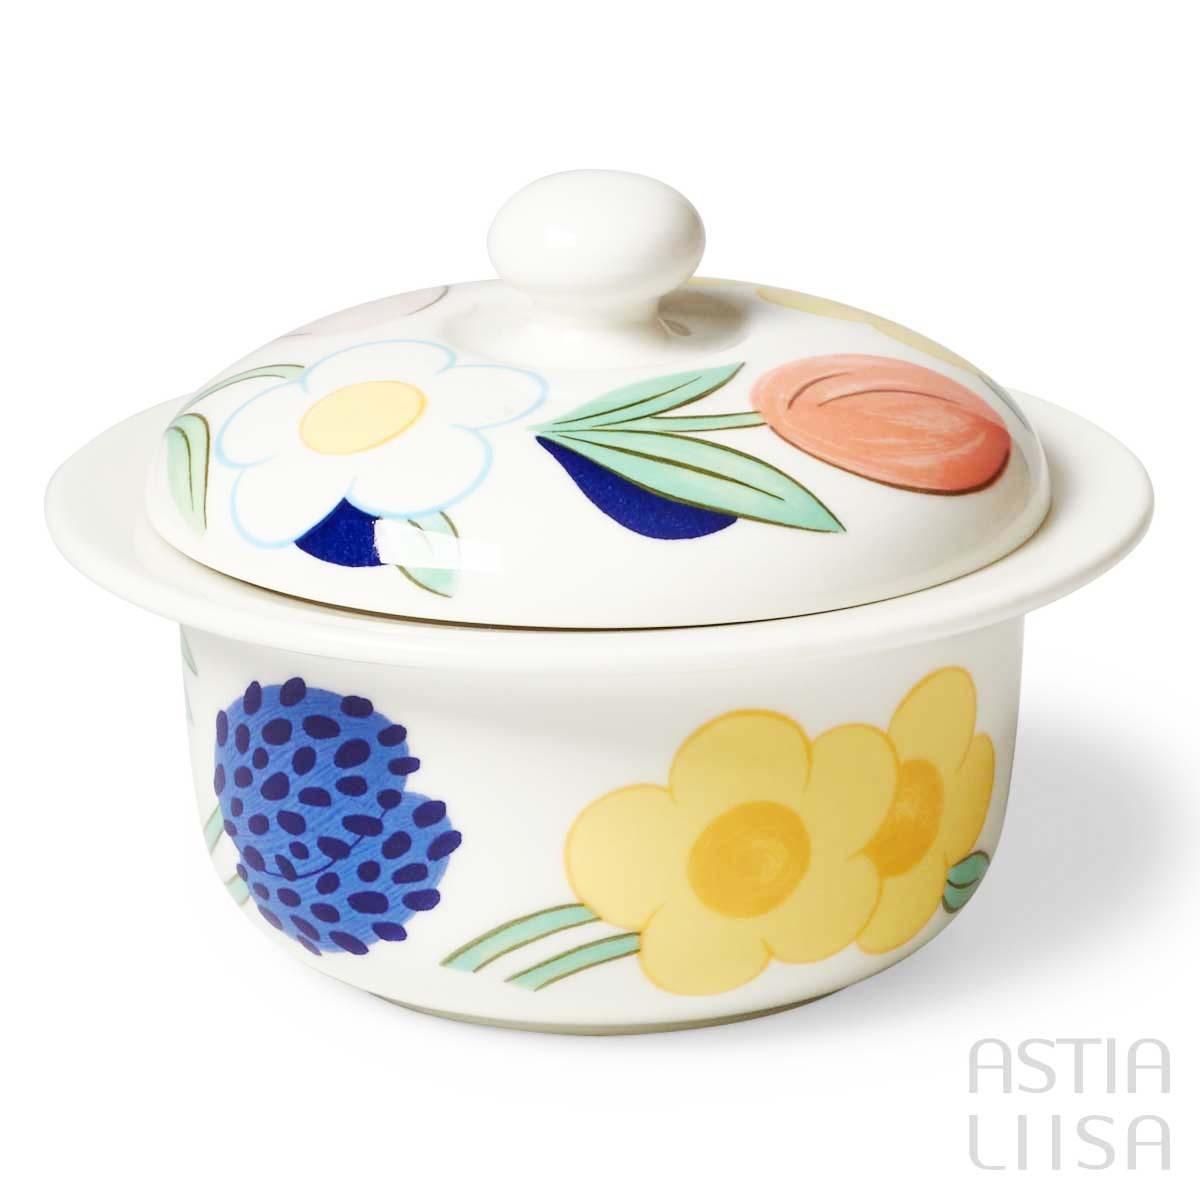 Finland Arabia Arctica Sugar Bowl W//C 0.26 L